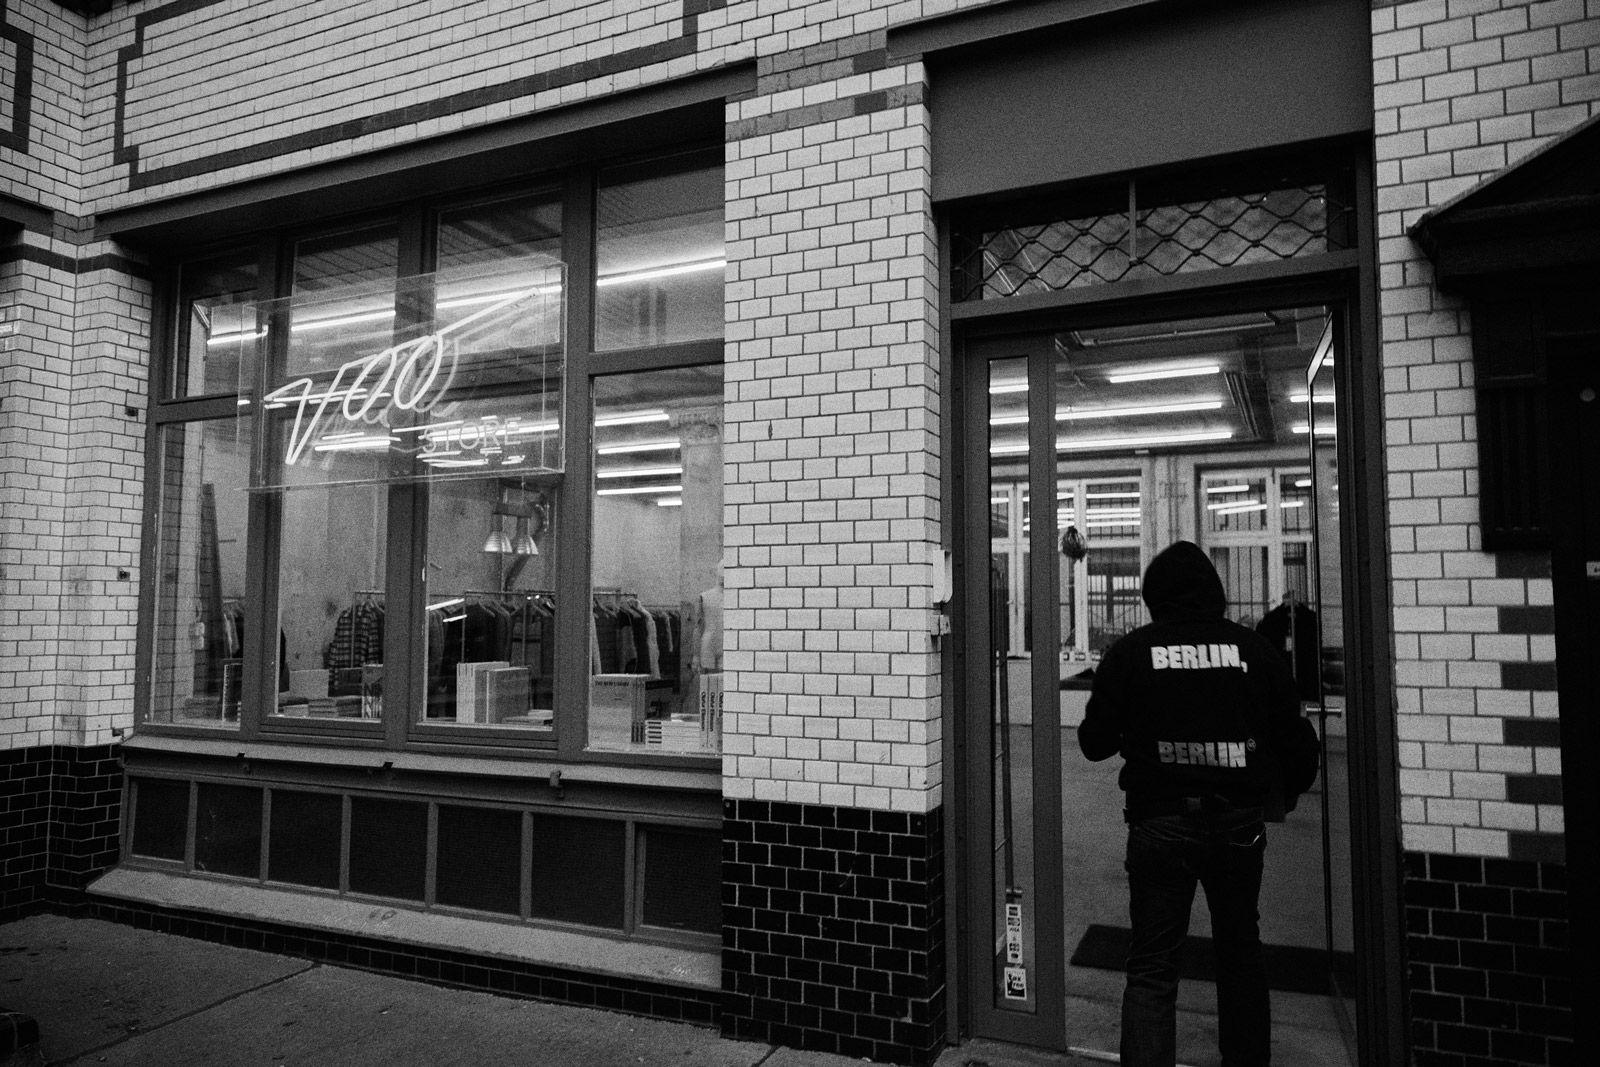 voo-store-lockdown-bb-01